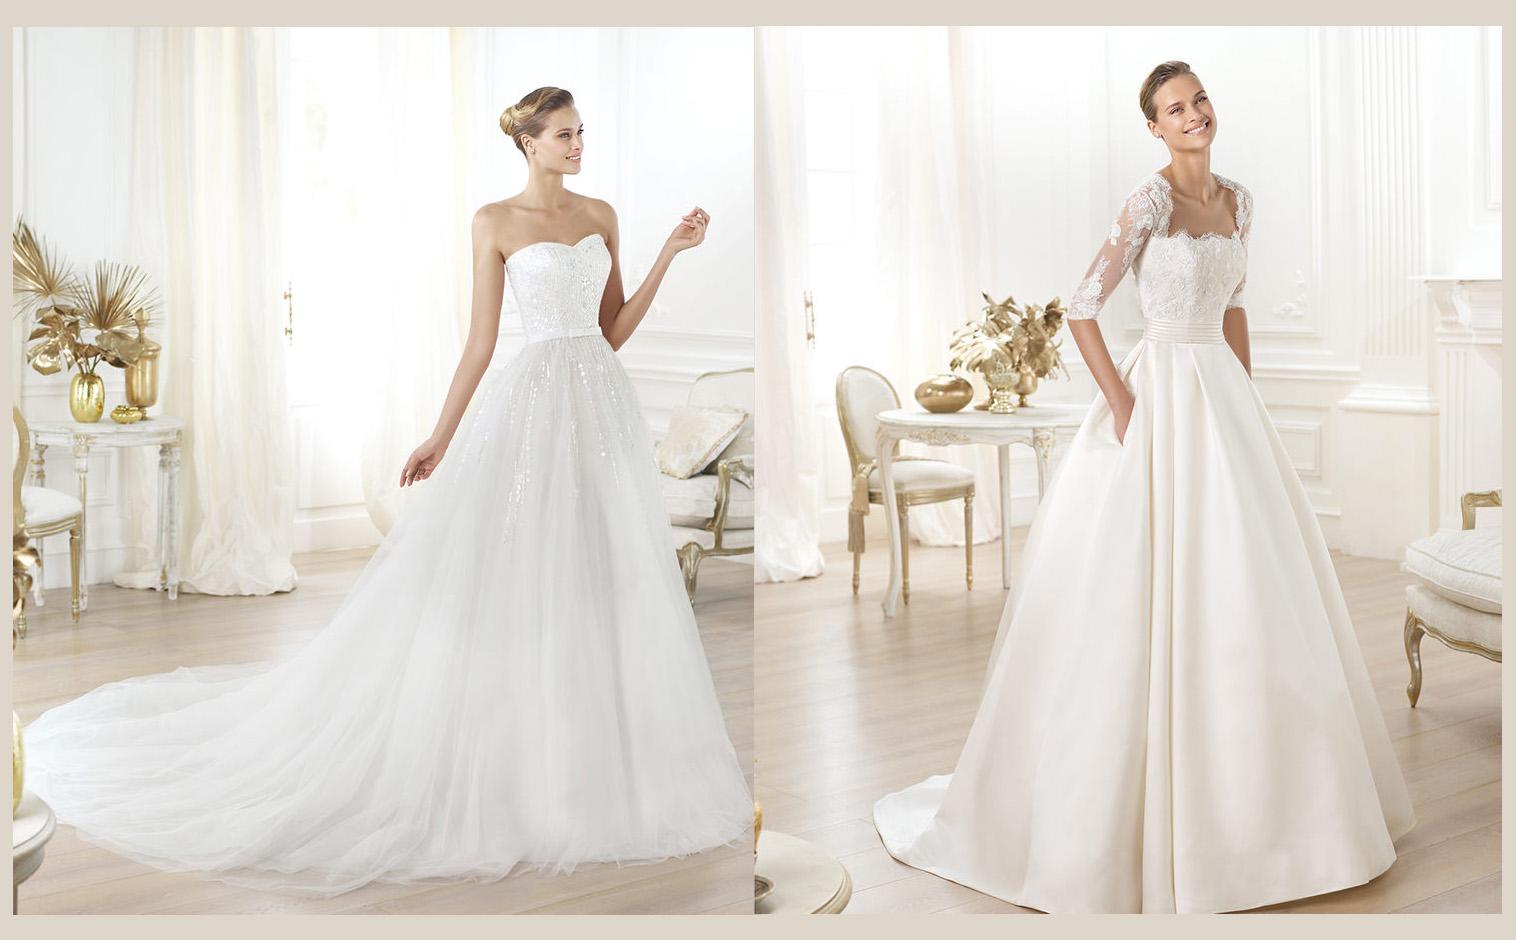 Vestidos de novia pronovias coleccion 2012